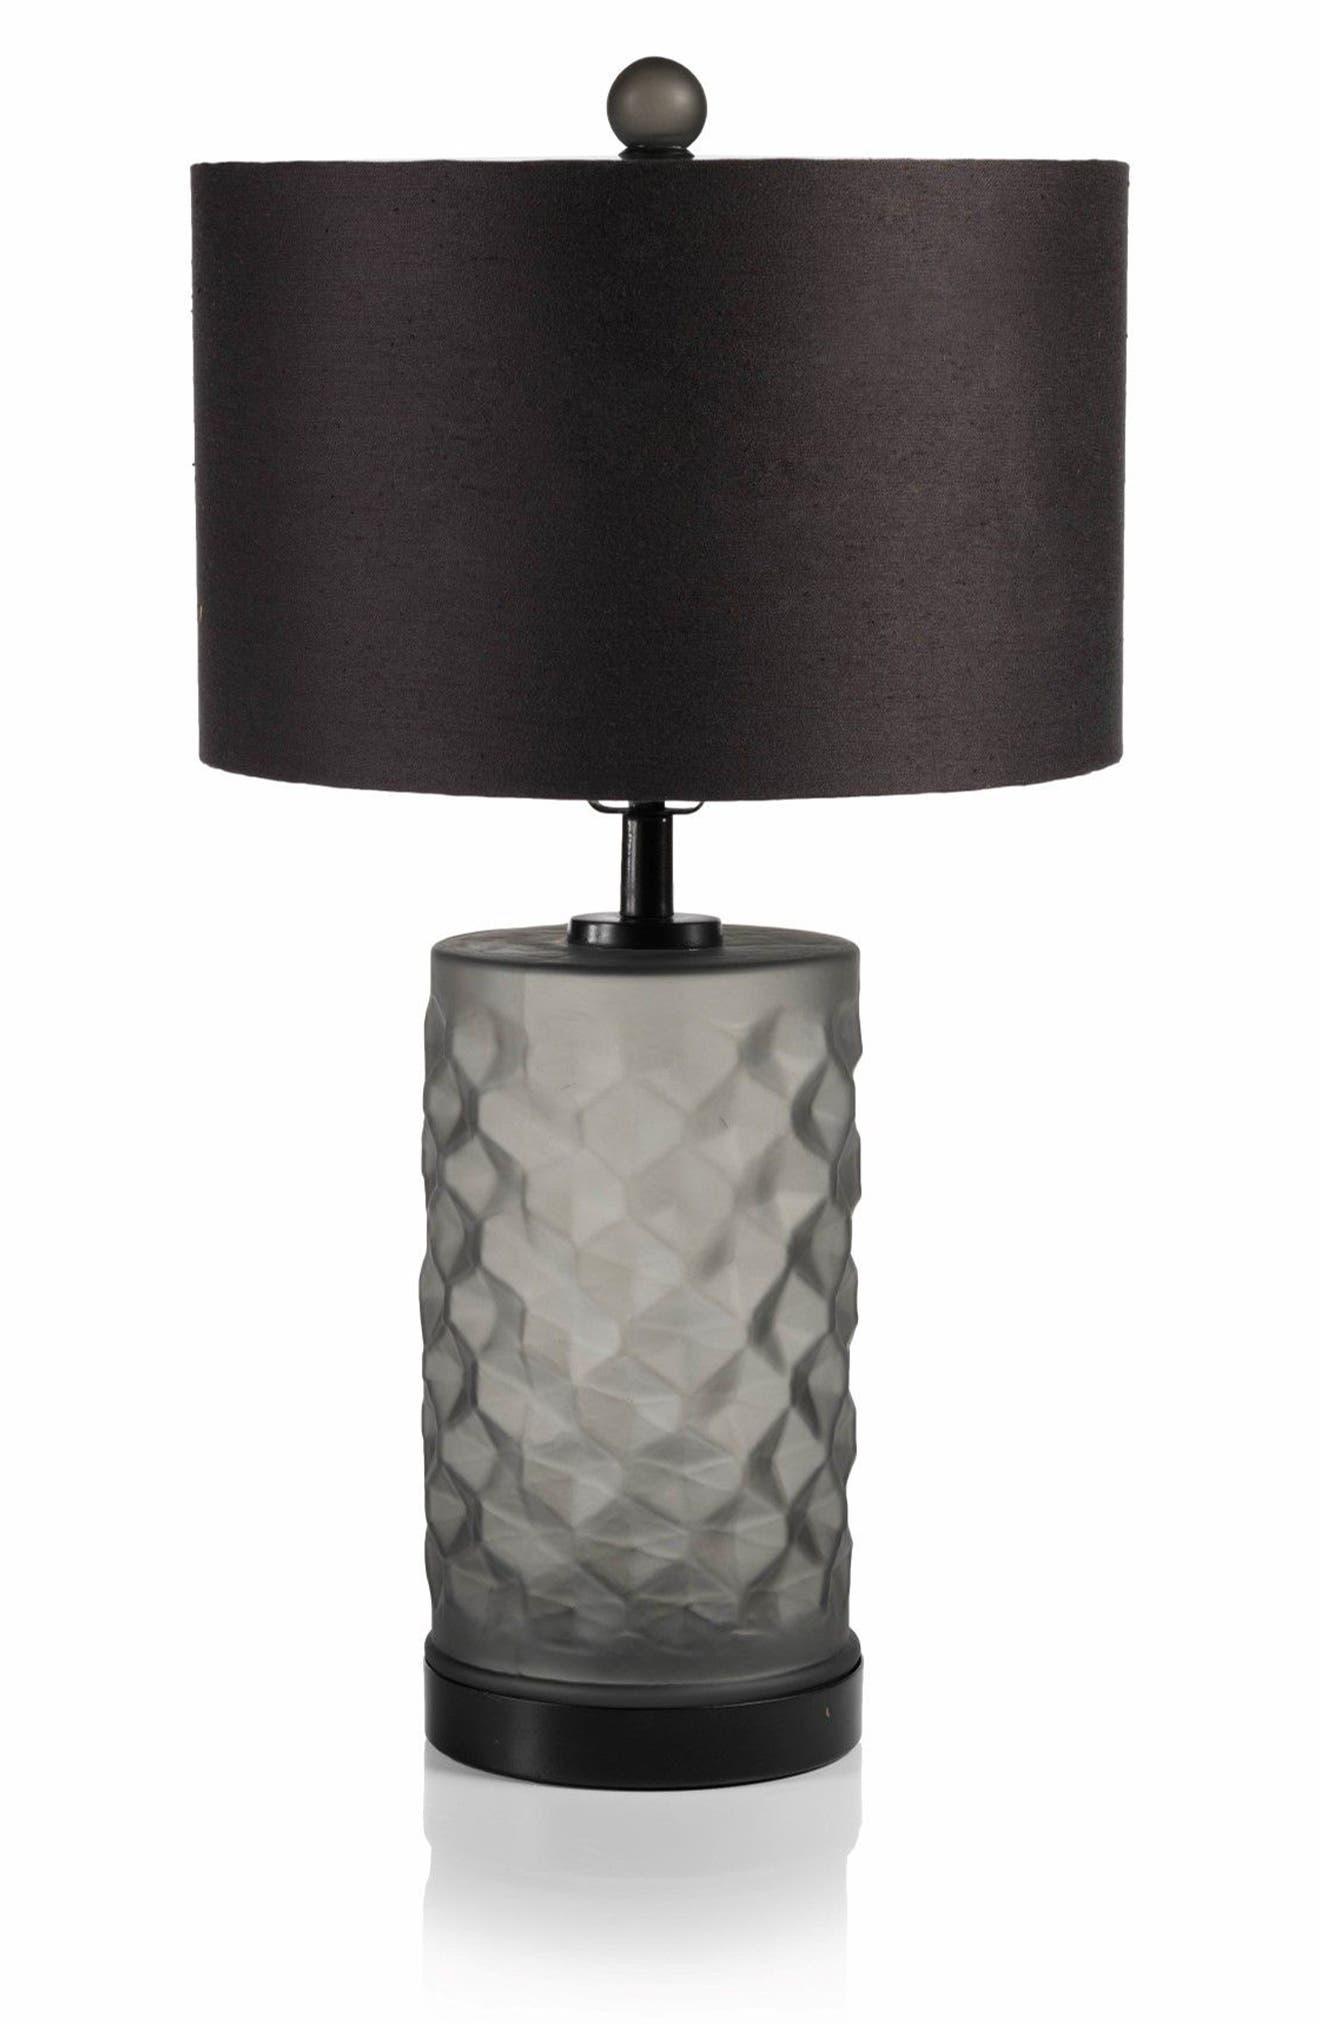 Rocco Table Lamp,                             Main thumbnail 1, color,                             Black/ Grey